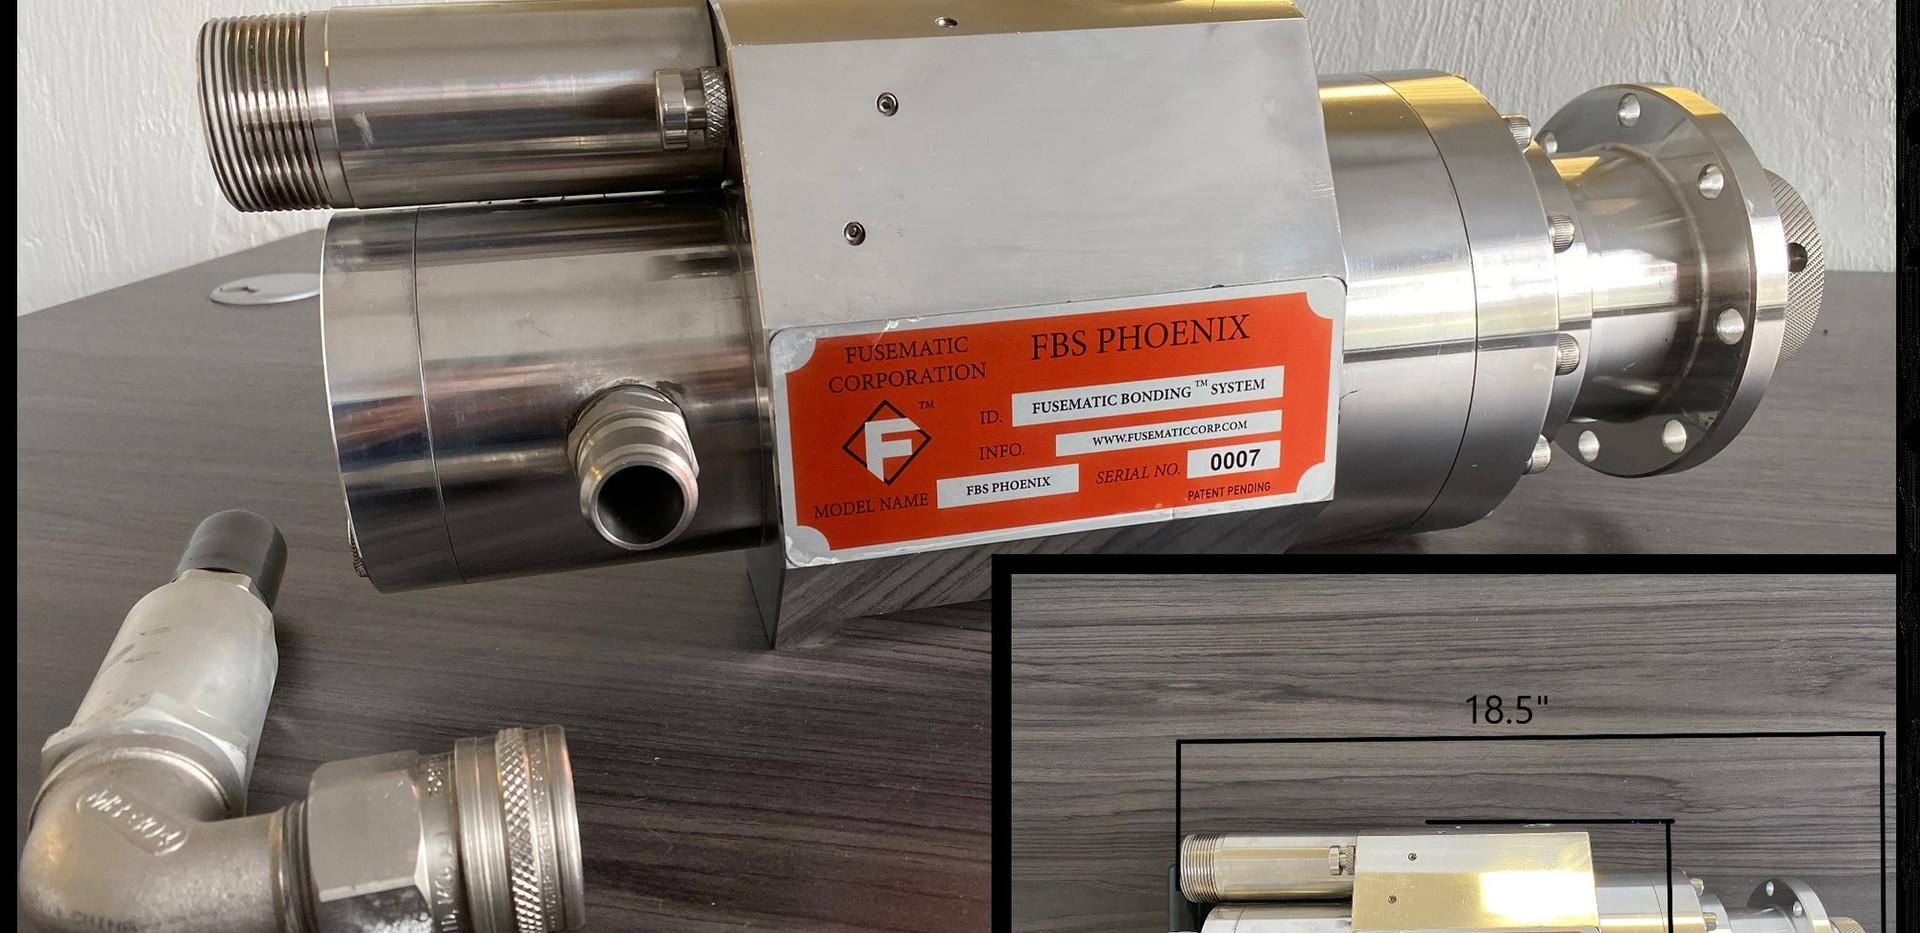 Phoenix Fusematic Bonding System (FBS)